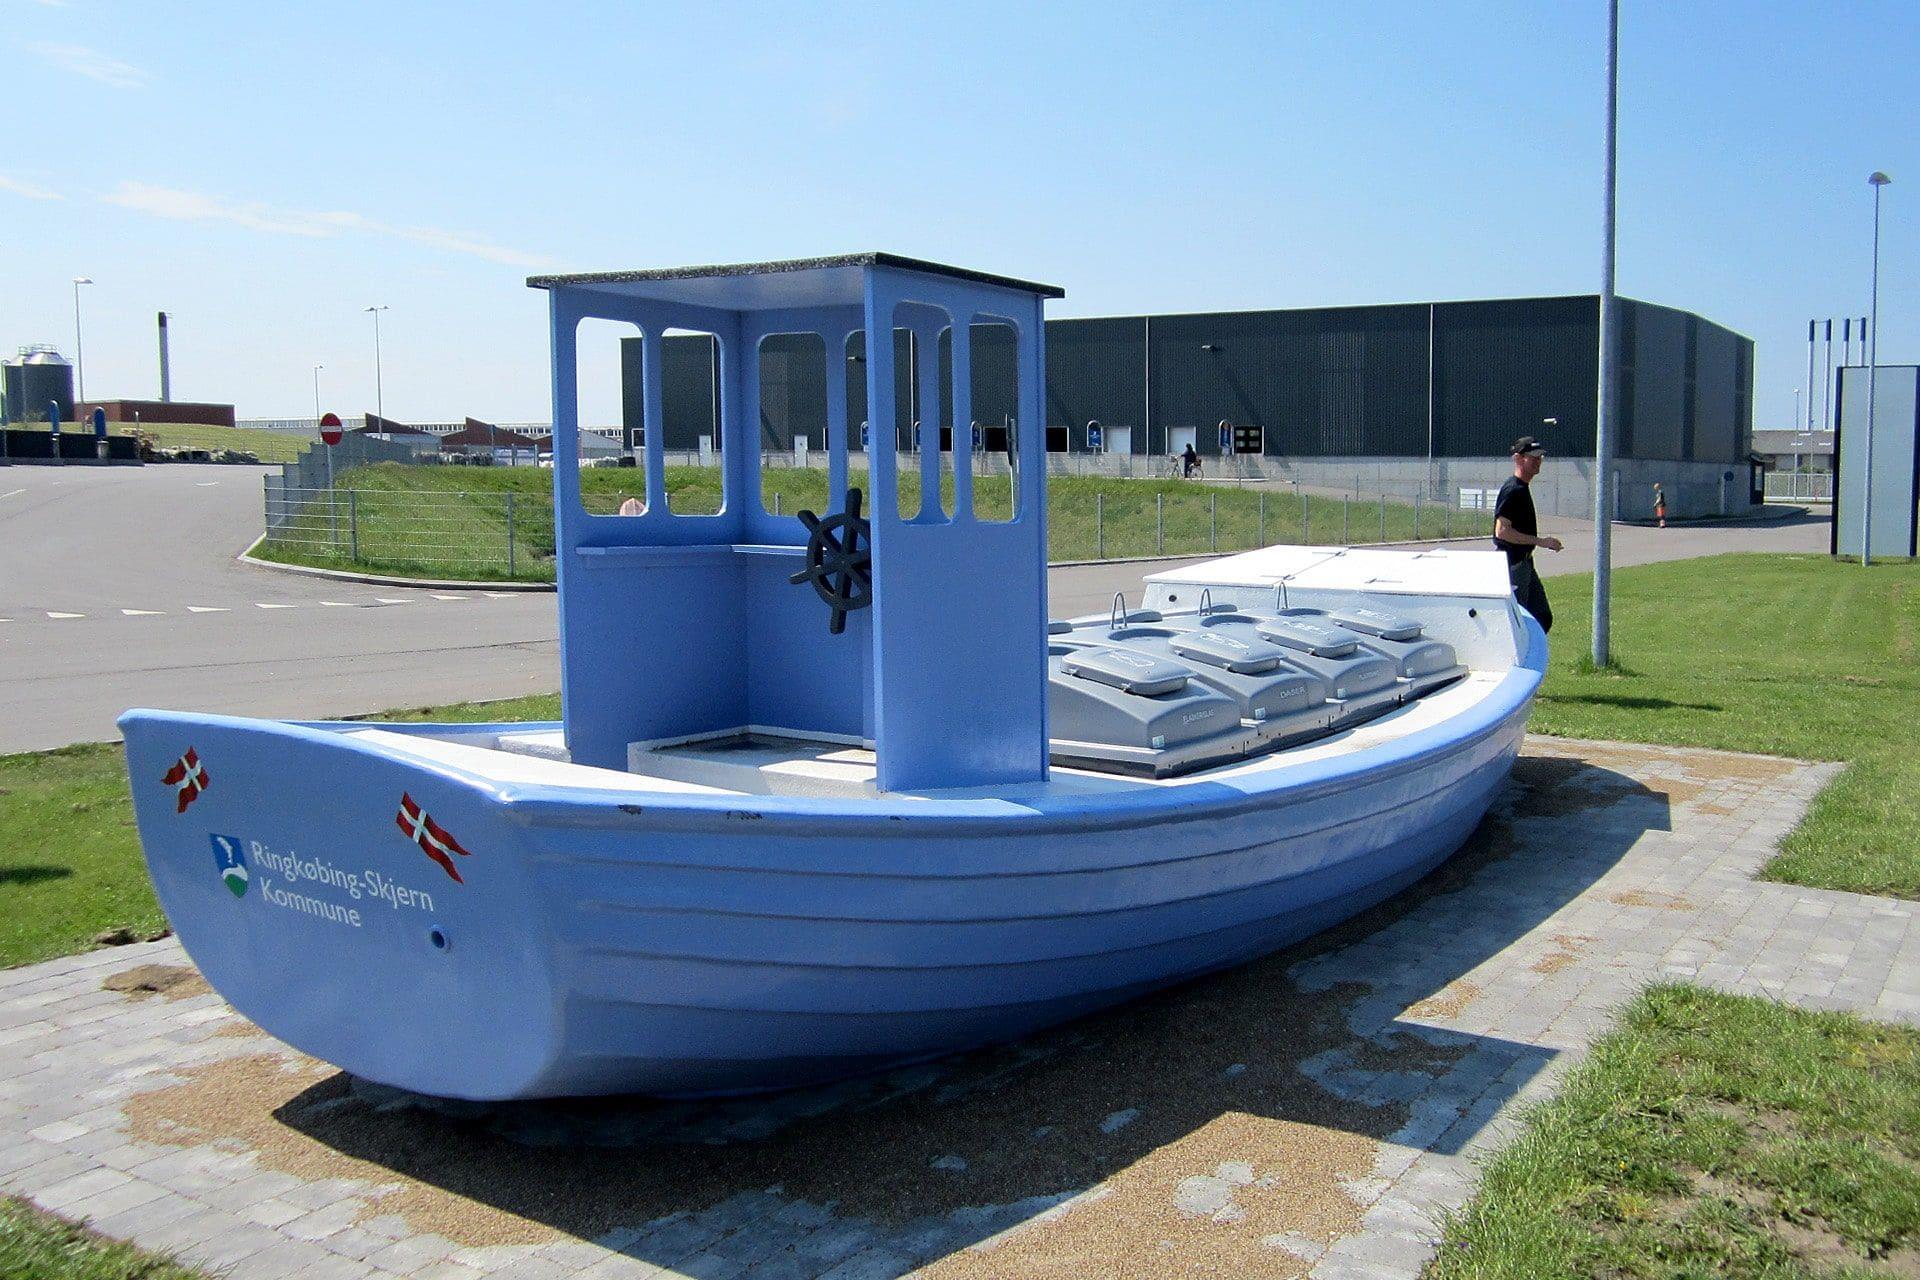 Specialløsning med Molok®Domino i båd, genbrugsplads Ringkøbing